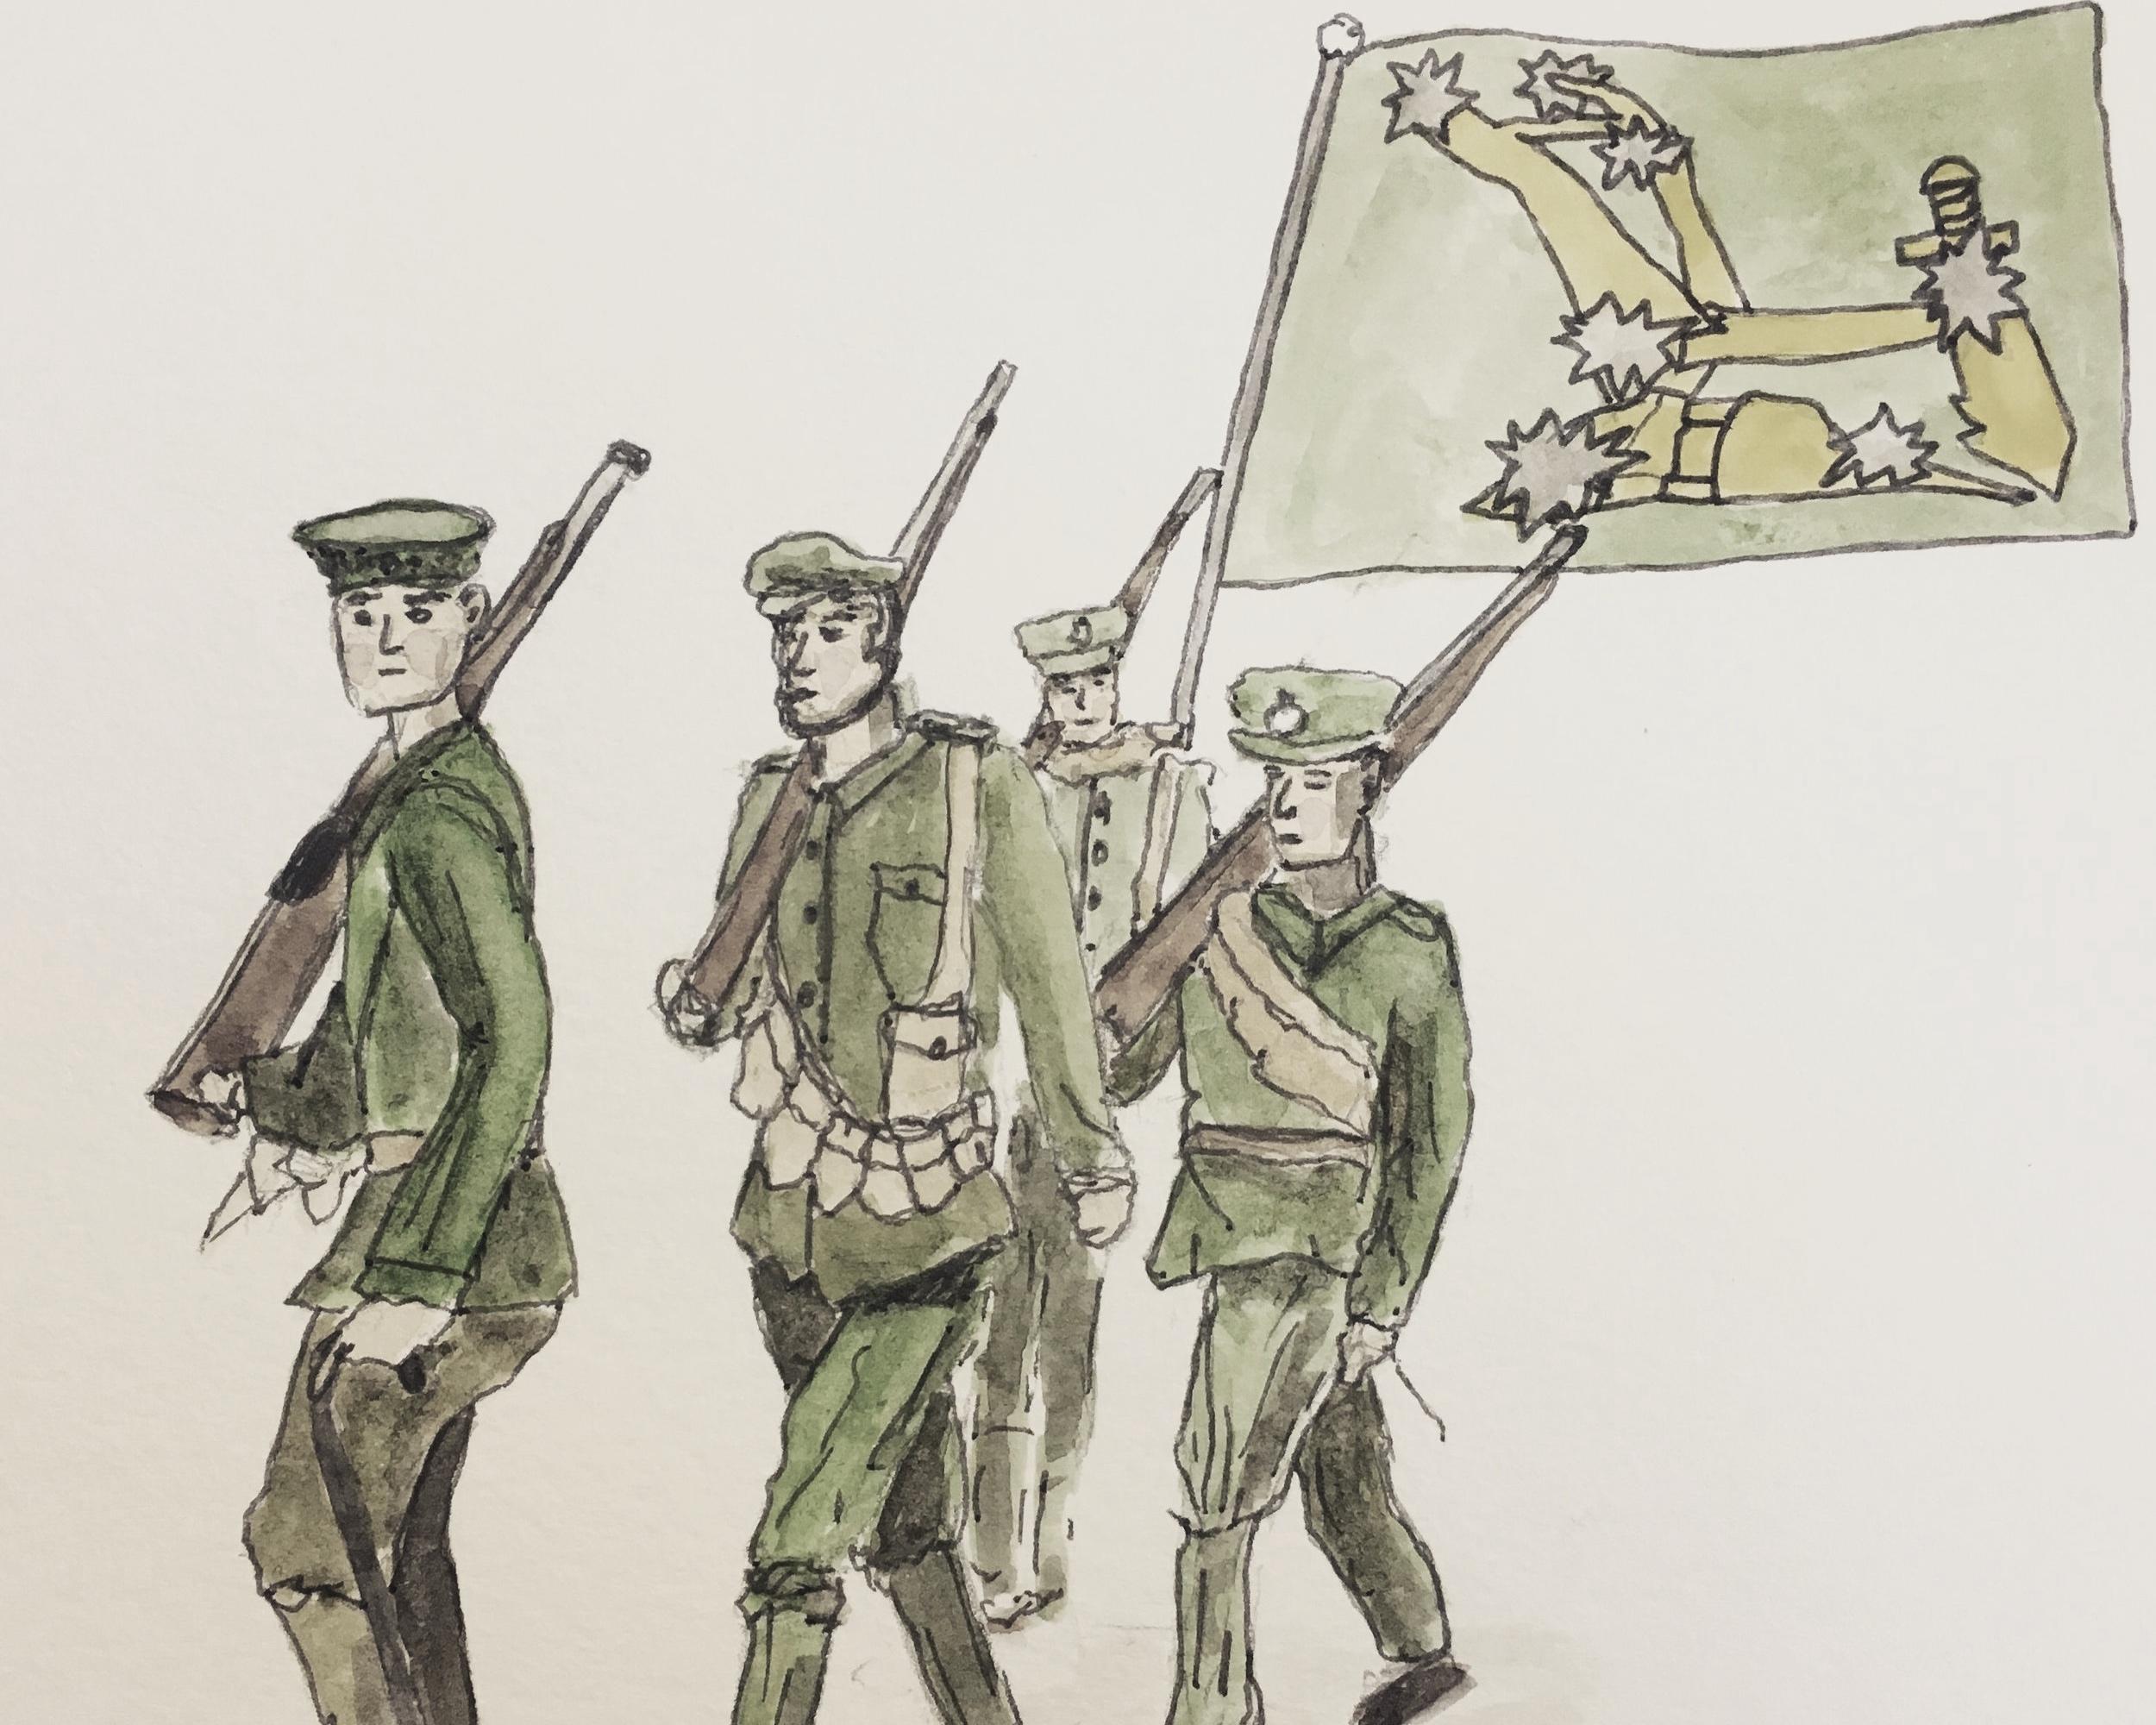 Irish Citizen Army Marching